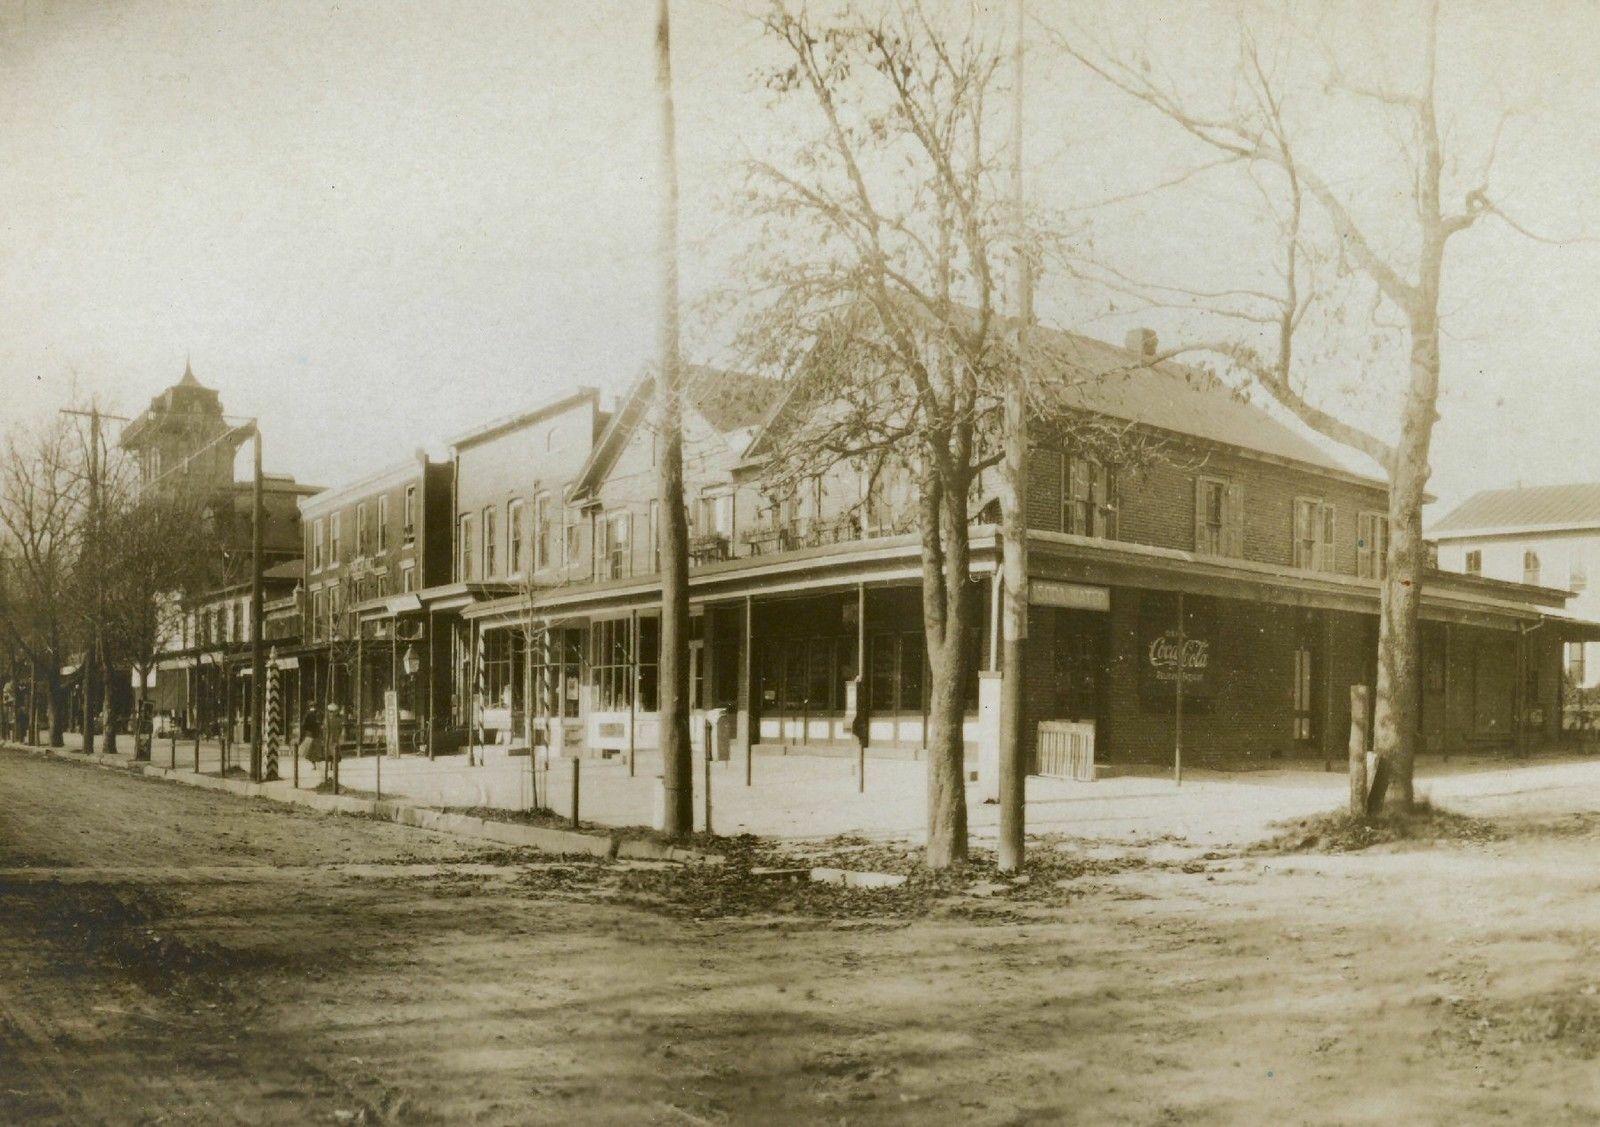 Turn of 19th century Vineland, NJ 7th and Landis Ave